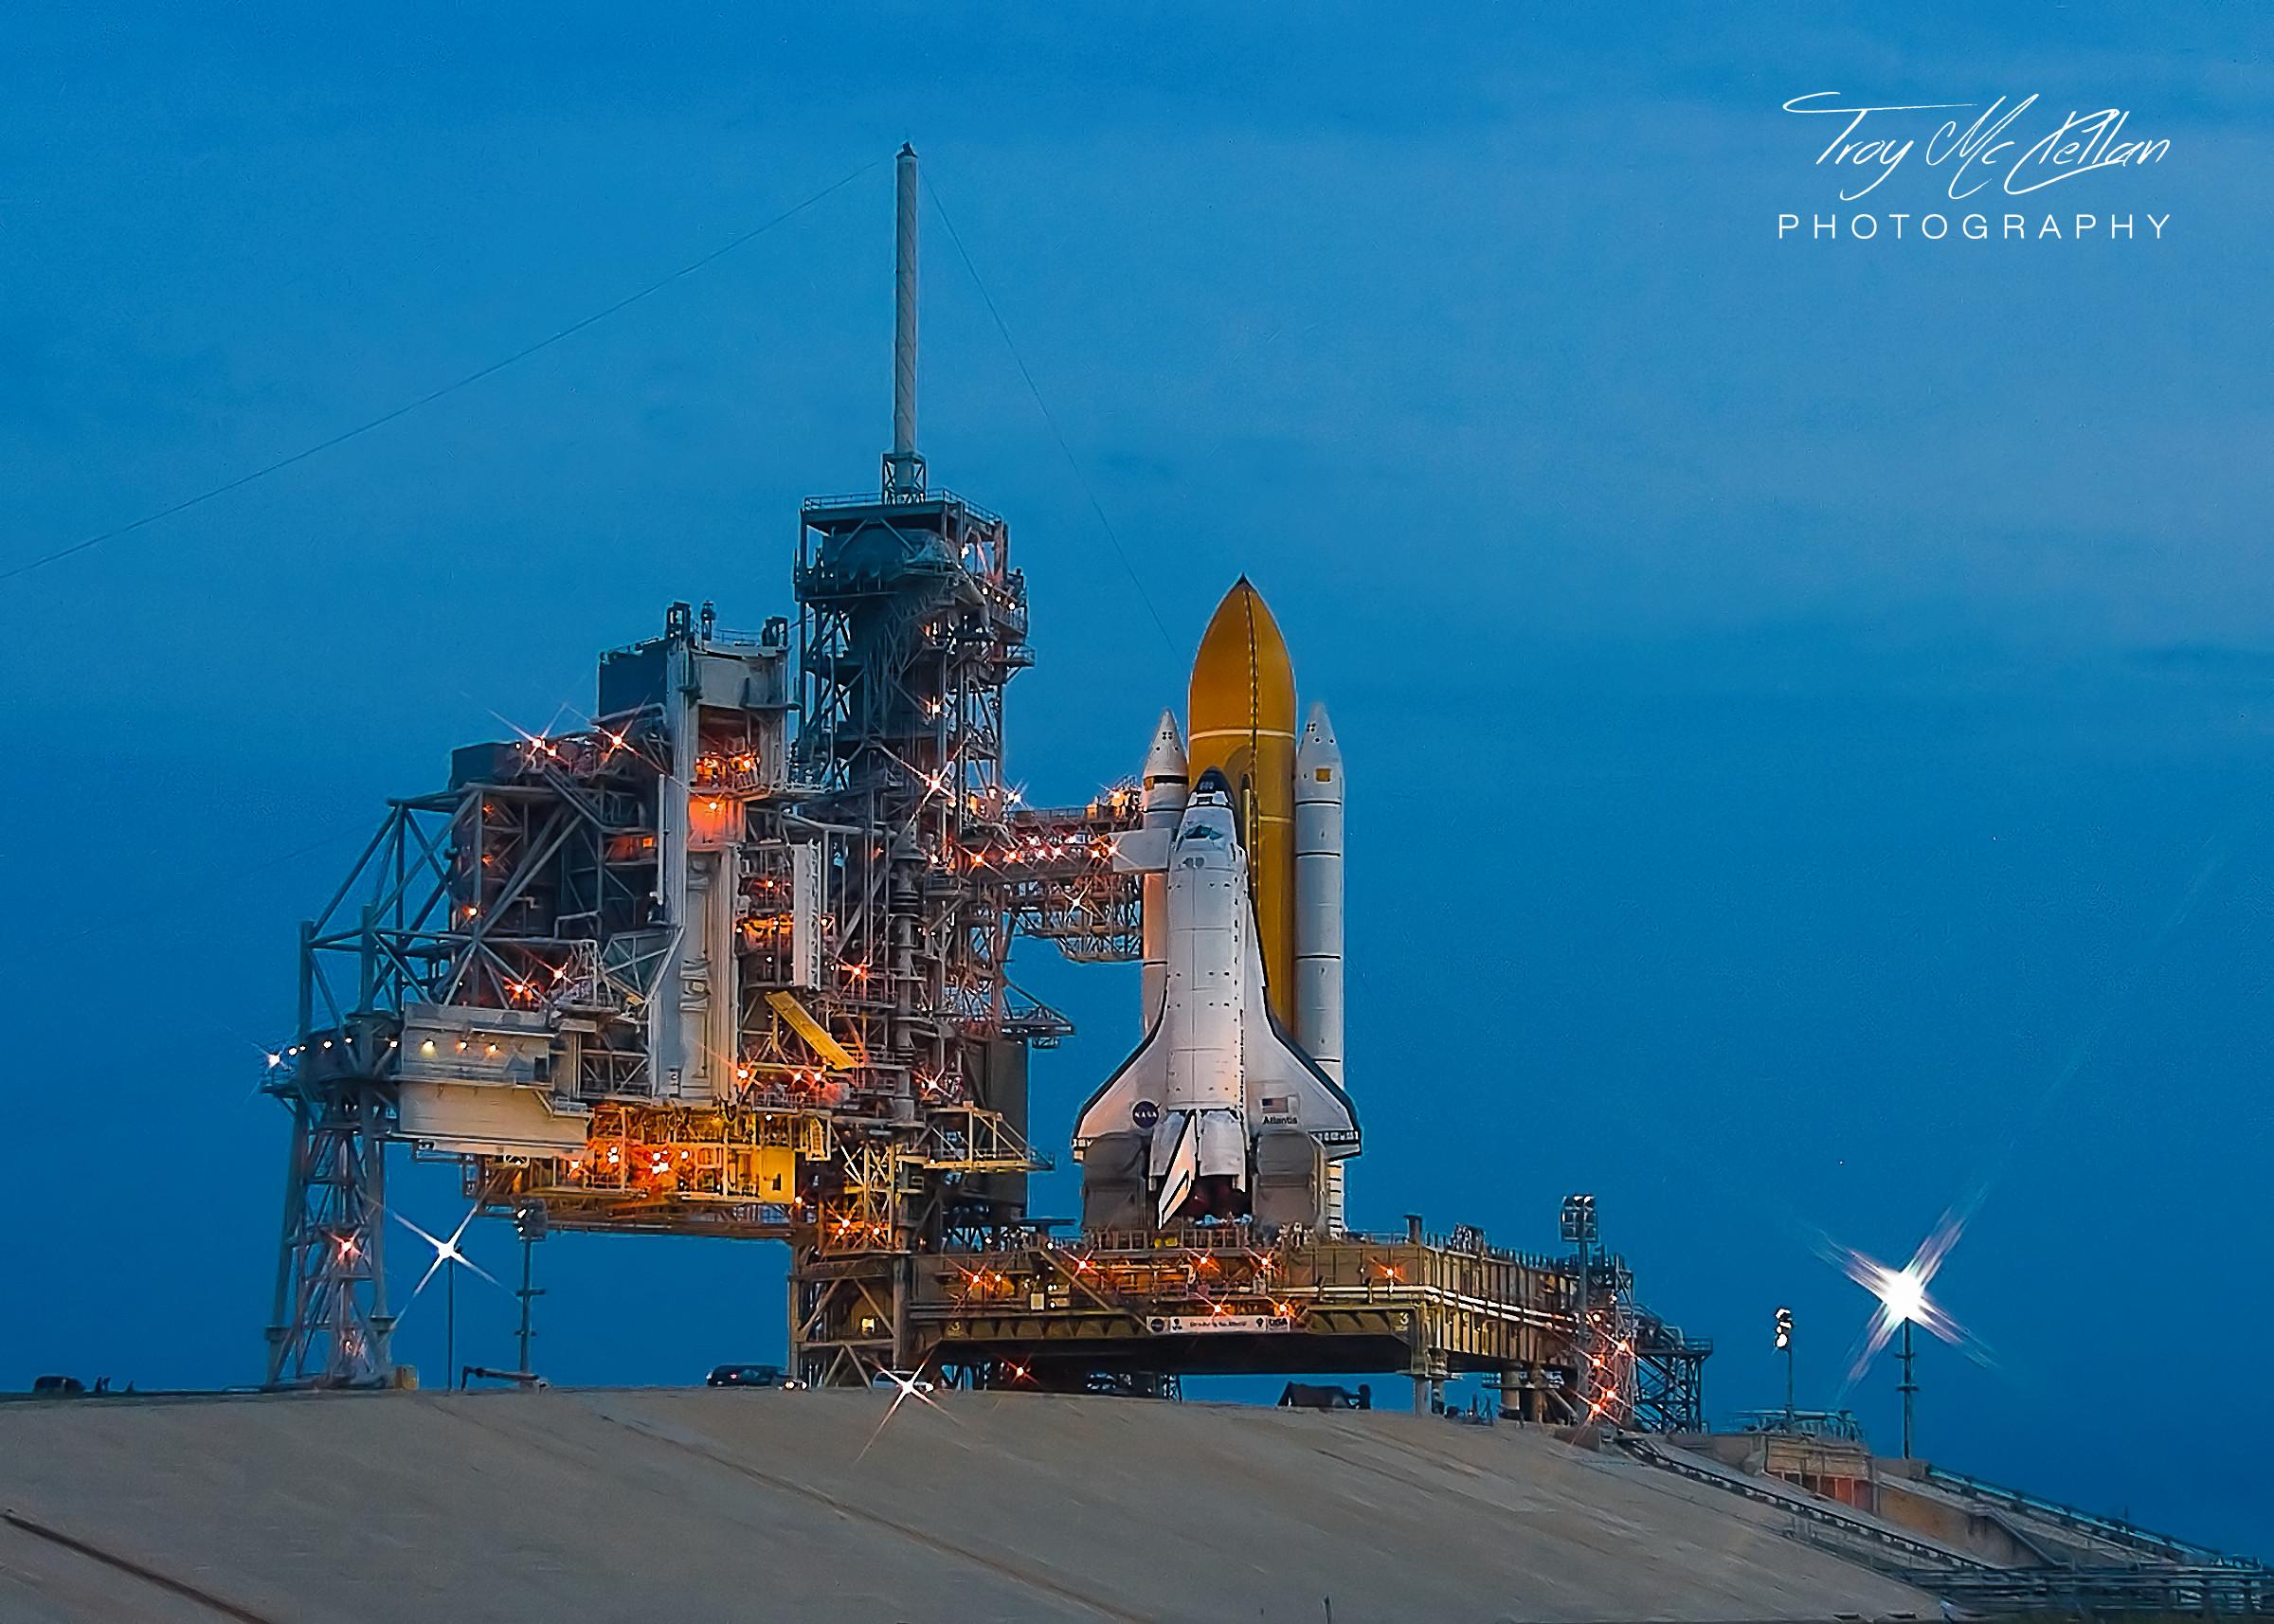 STS 135_Pad_HDR_WM